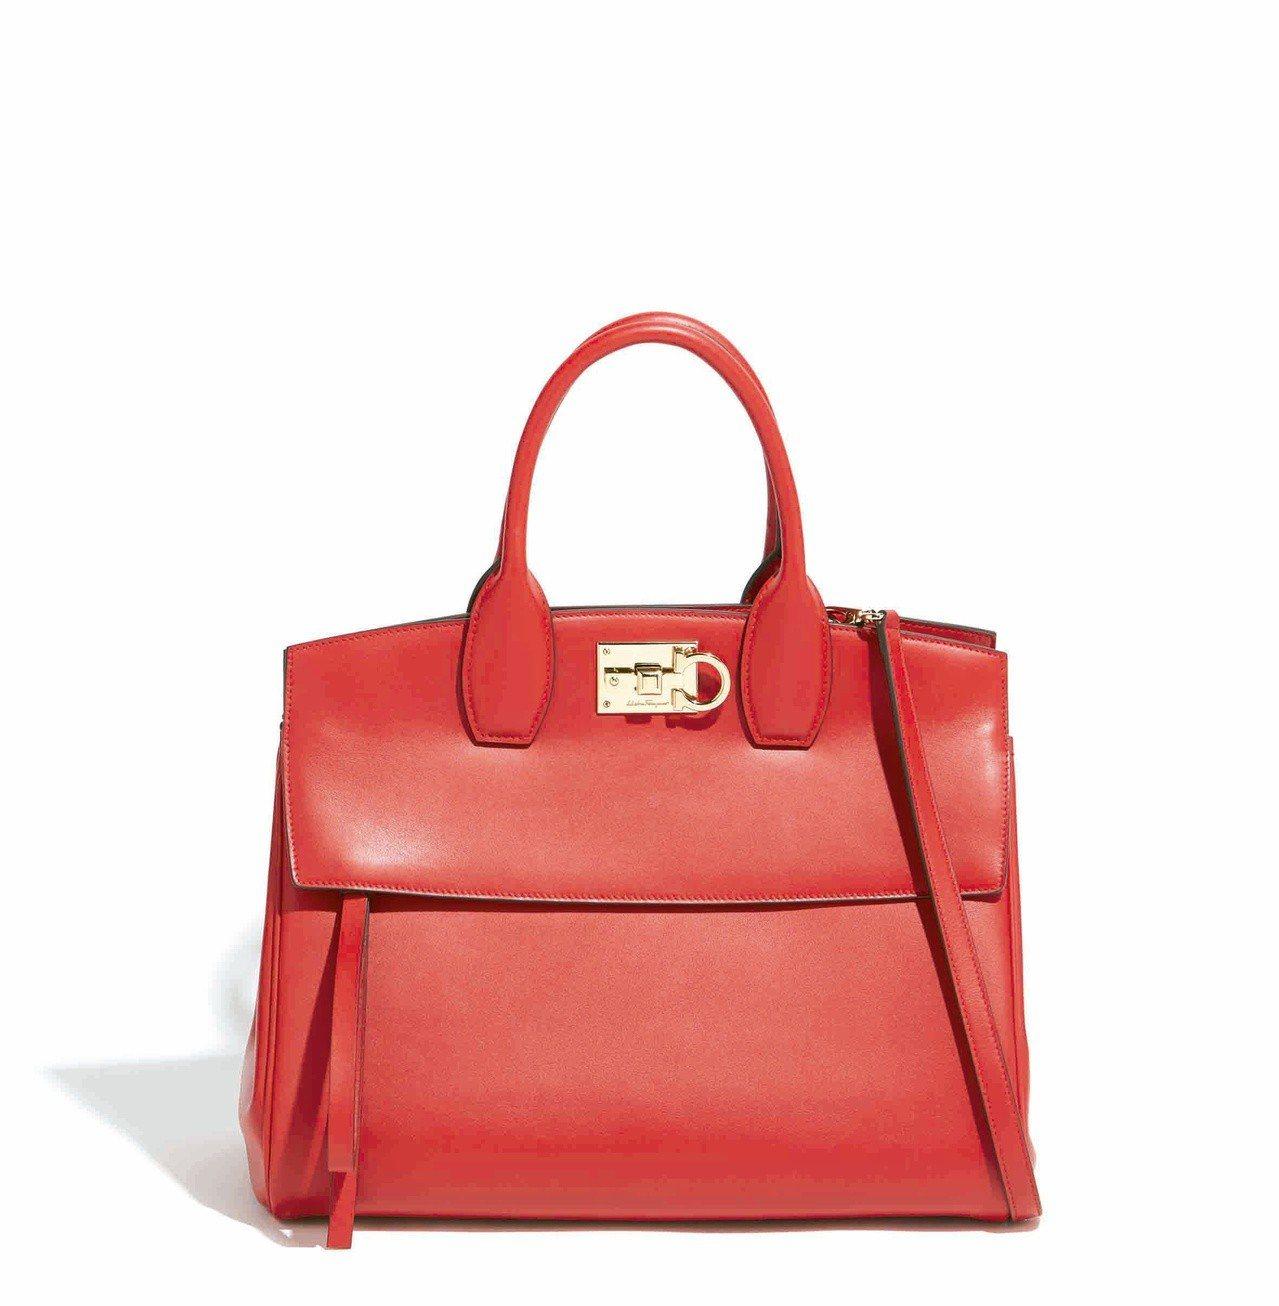 Studio紅色牛皮手提包(中),售價77,900元。圖/Salvatore F...